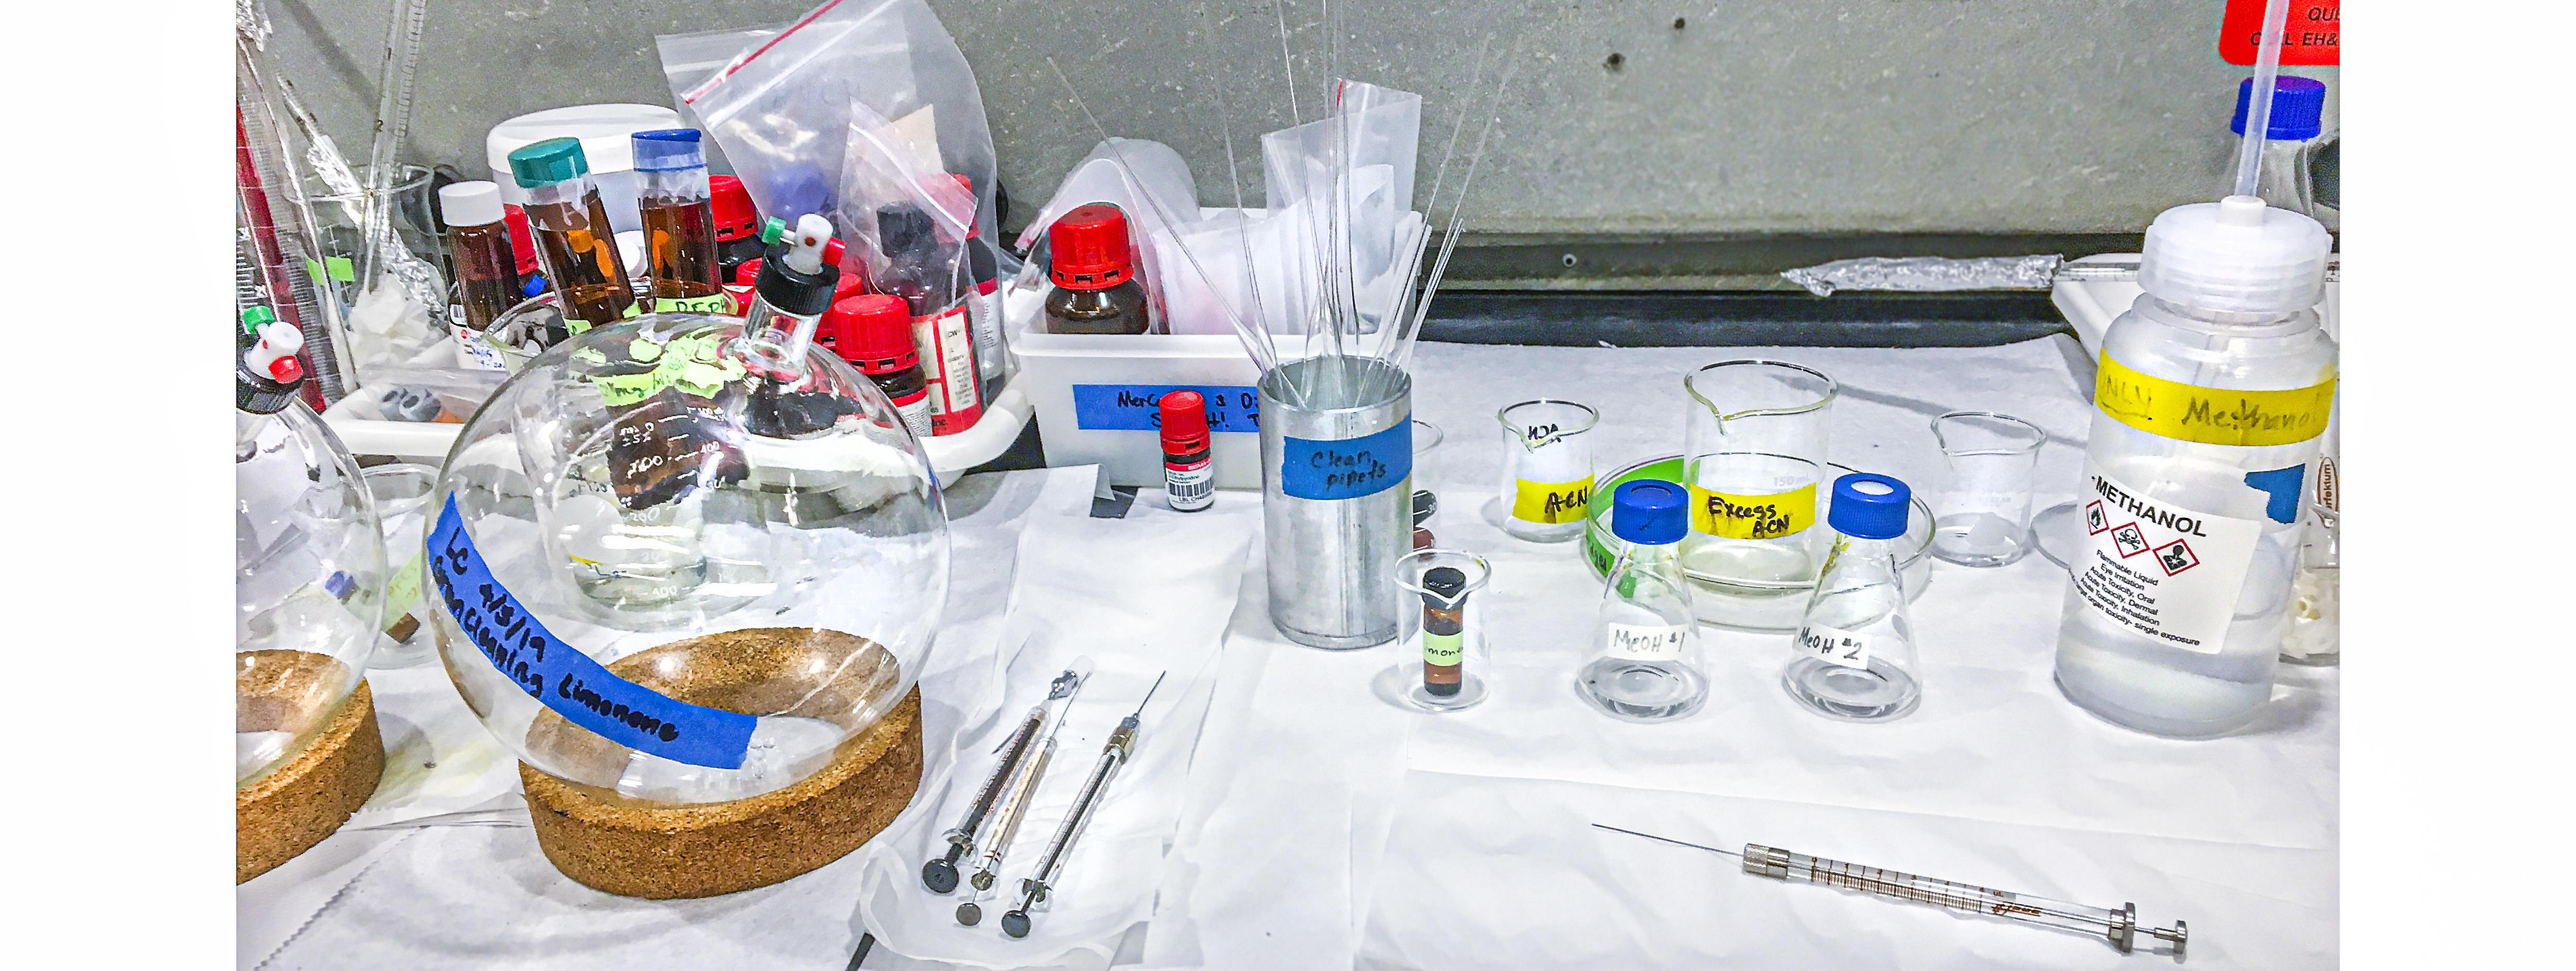 LUCIR Study LBNL Lab Equipment